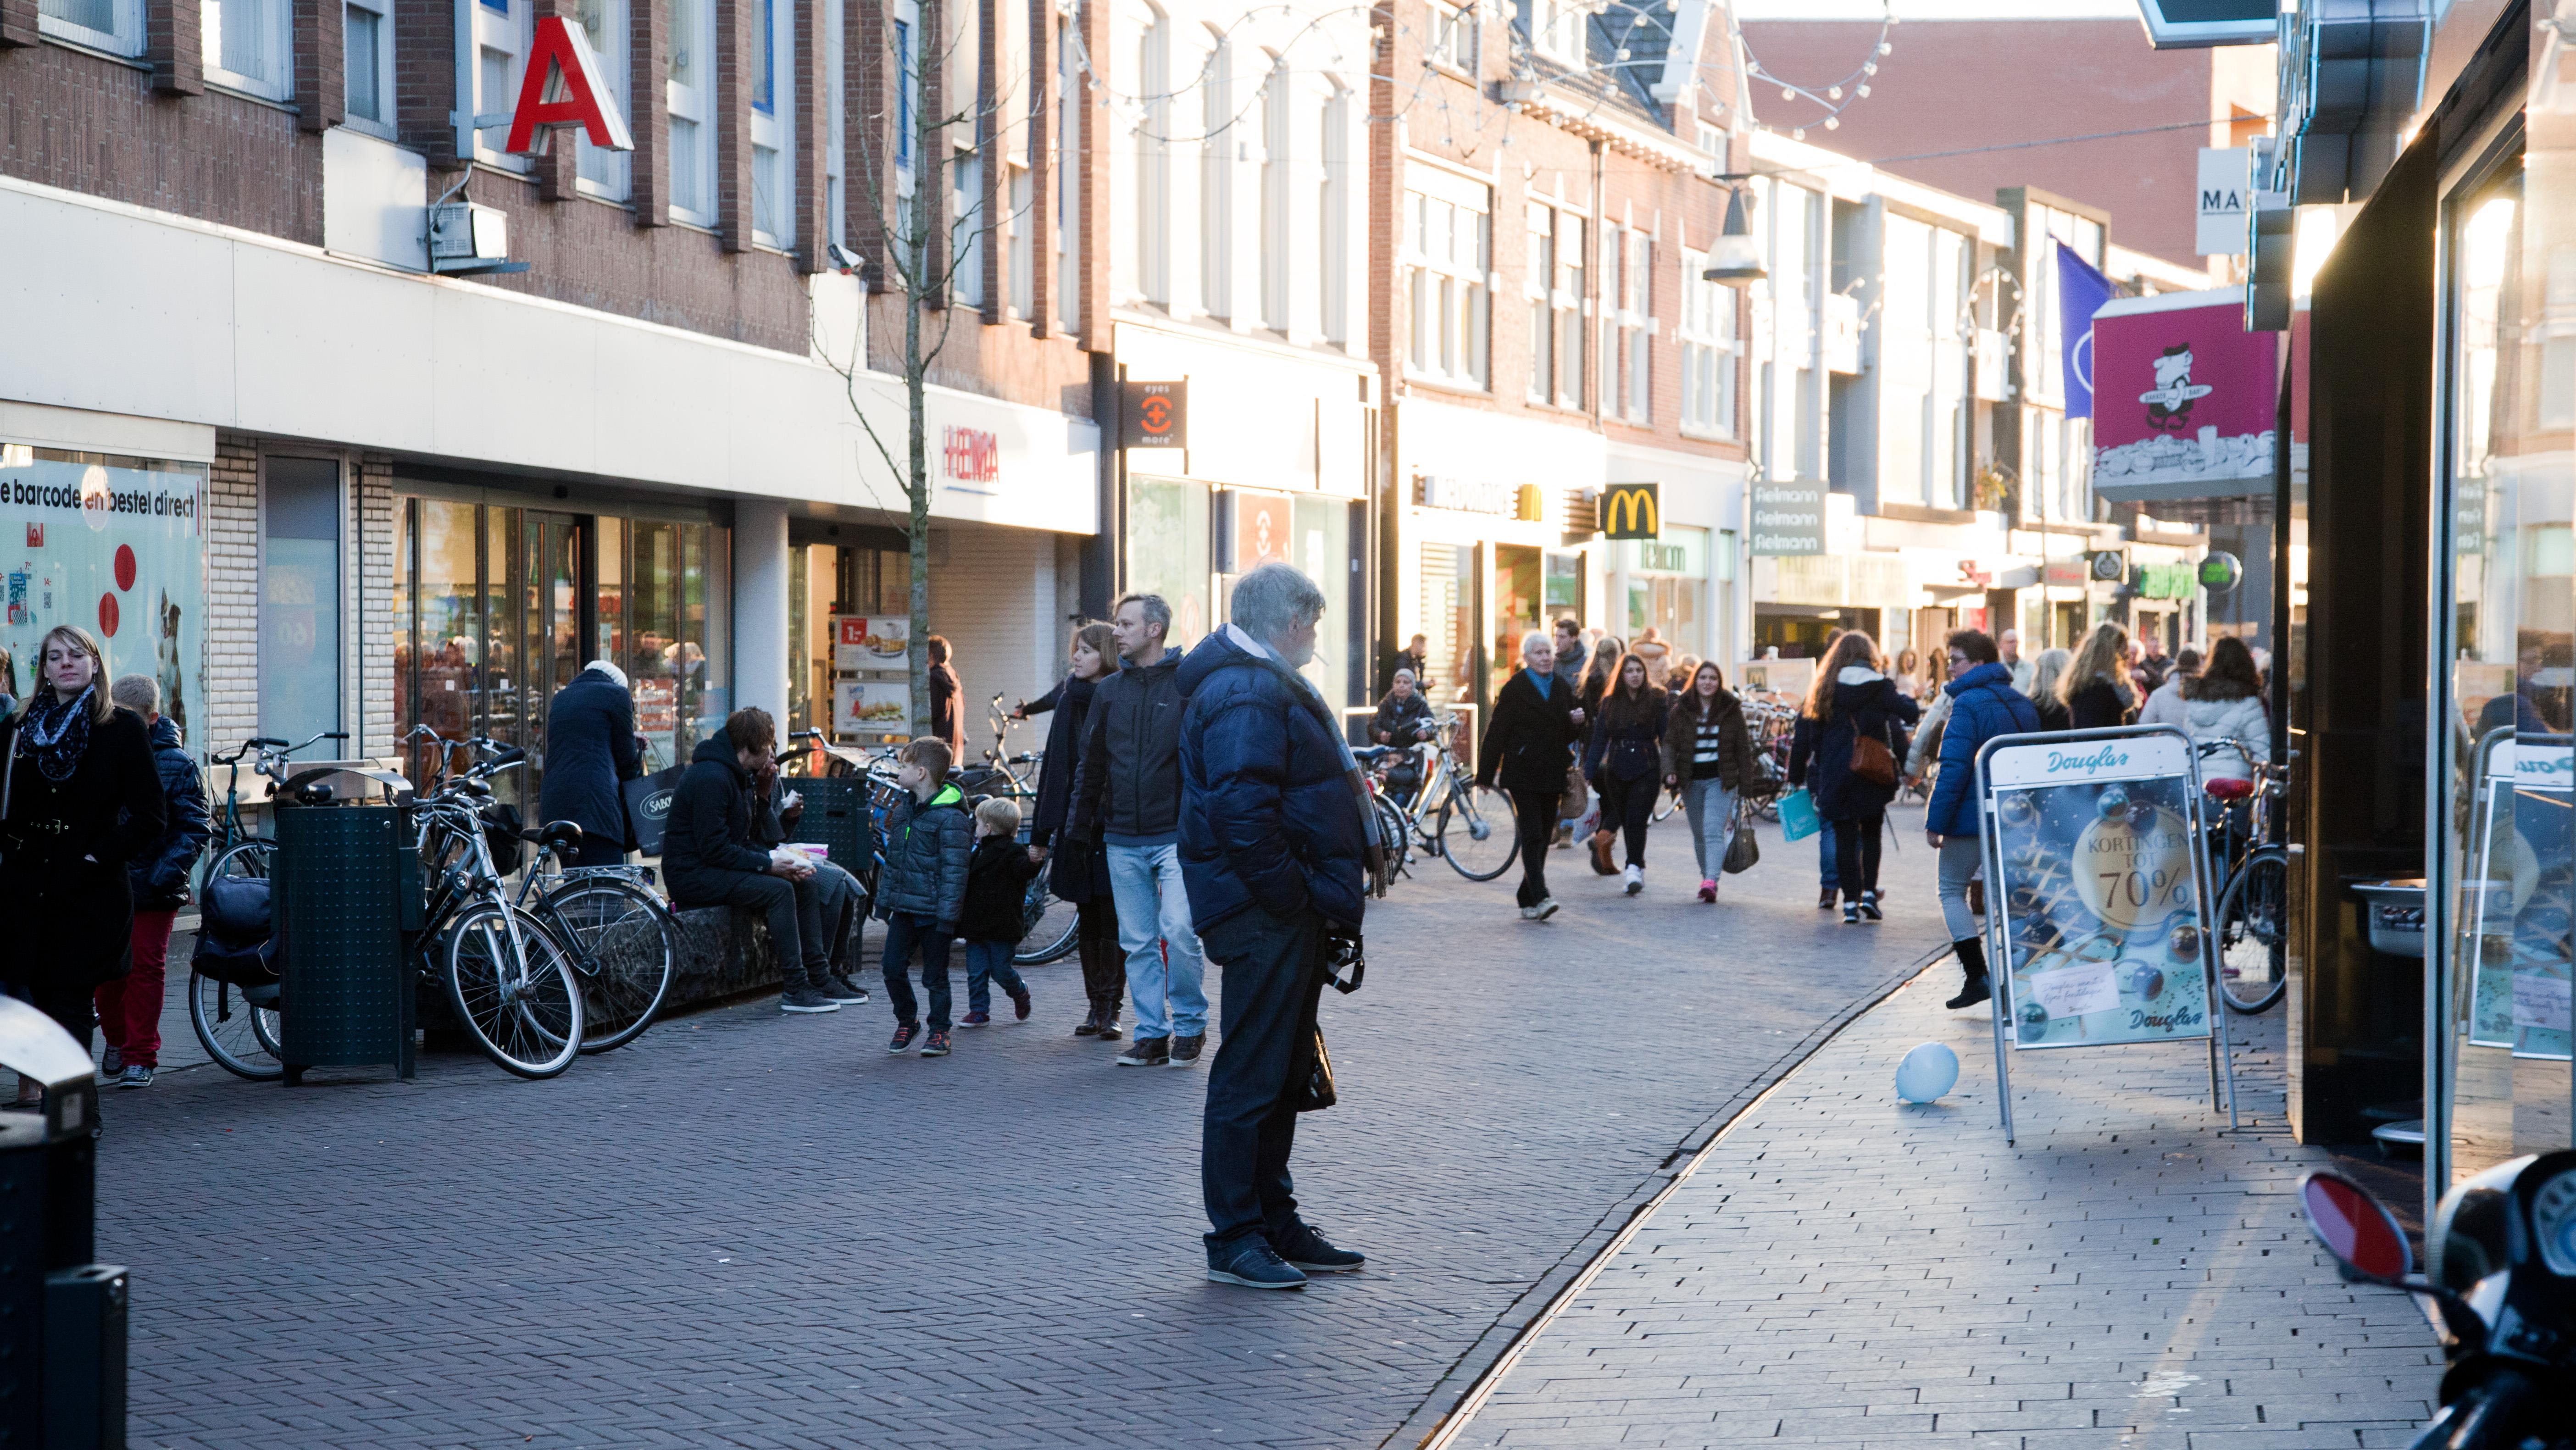 Turkse winkelketen karaca wil vestiging in enschede openen for Turkse kapper amsterdam oost